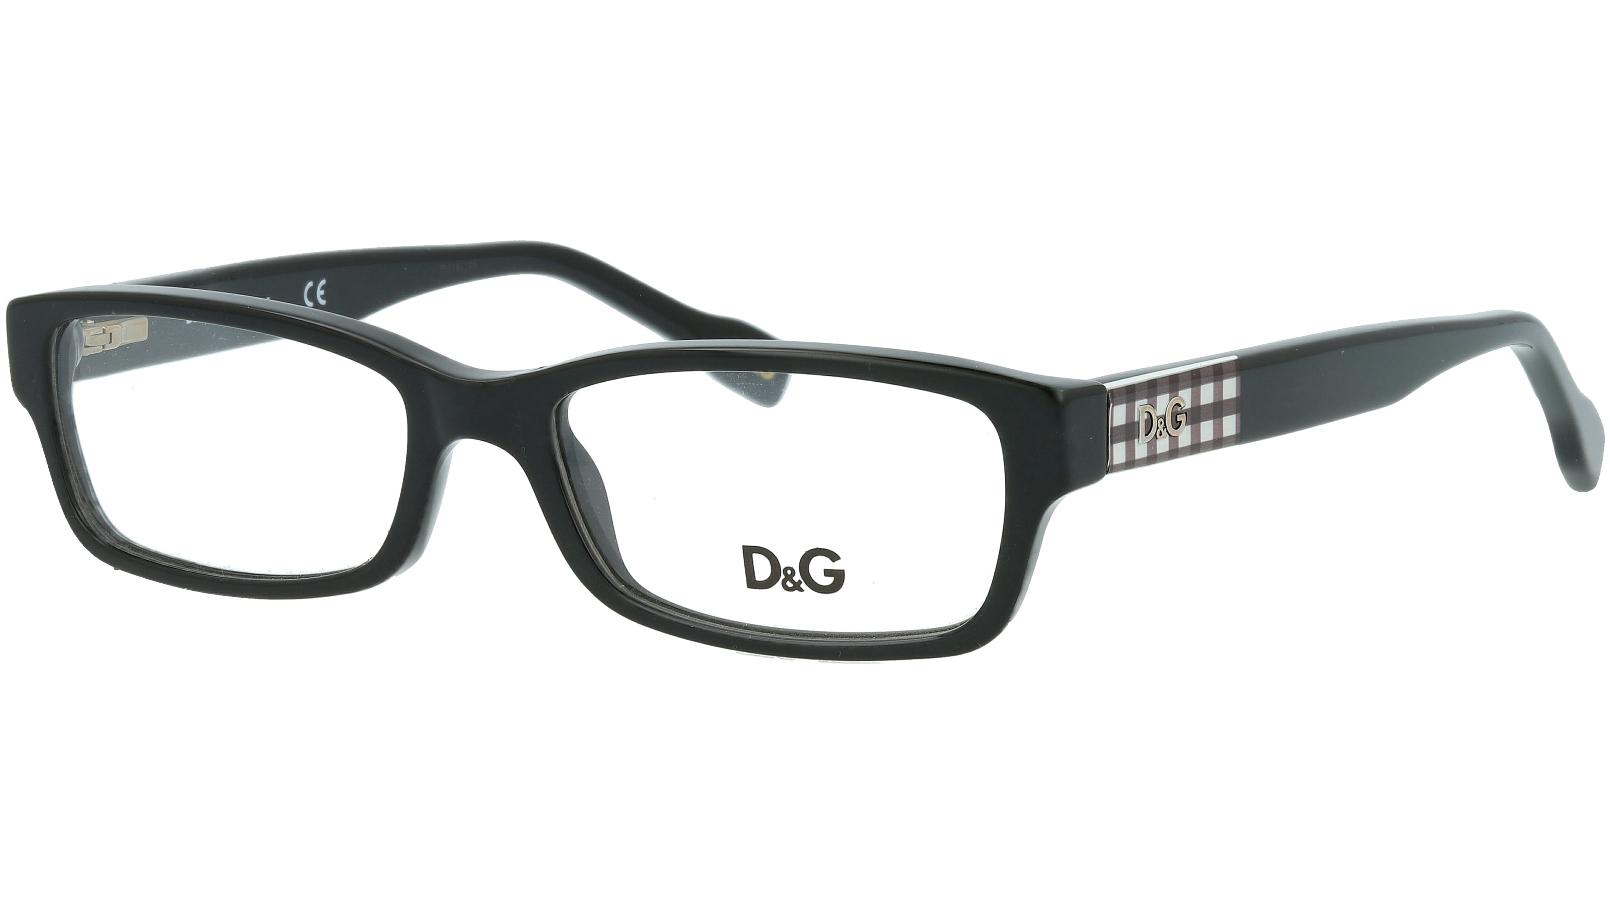 Dolce&Gabbana DG1207 1838 51 BLACK Glasses